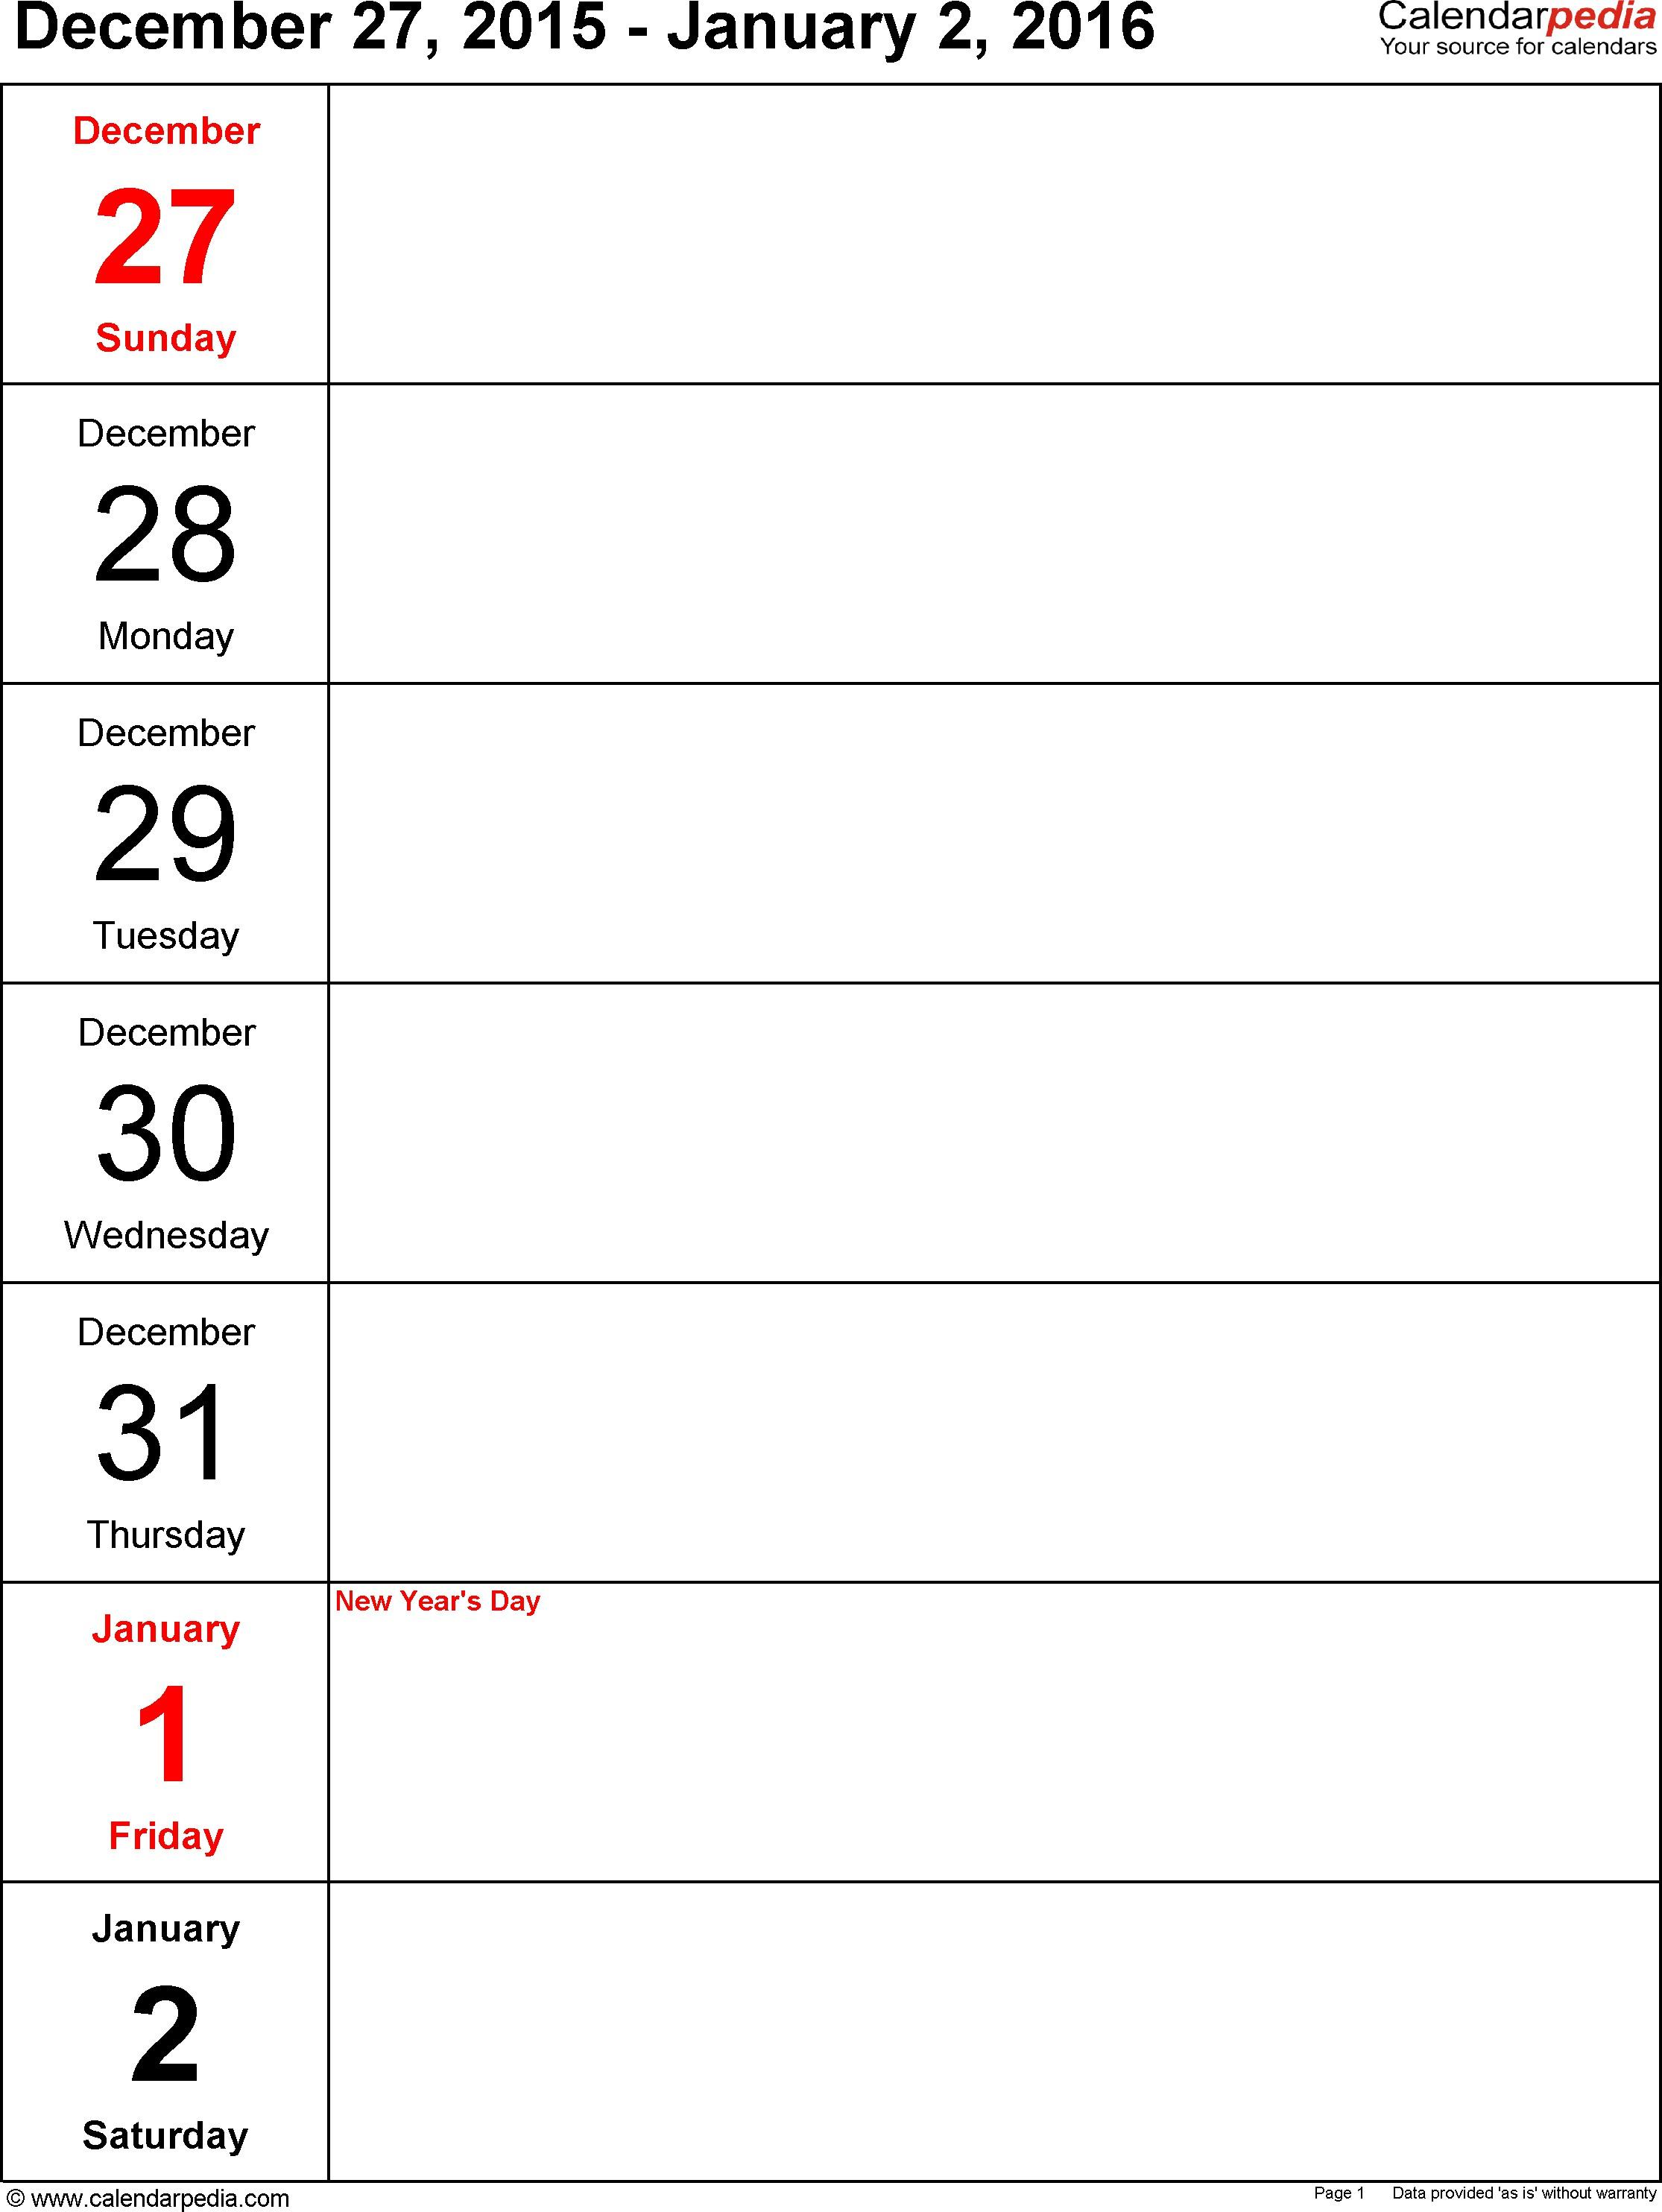 5 Day Printable Calendar Weekly Planner Calendar Template - Calendar with regard to Blank Calendar Printable 5 Day